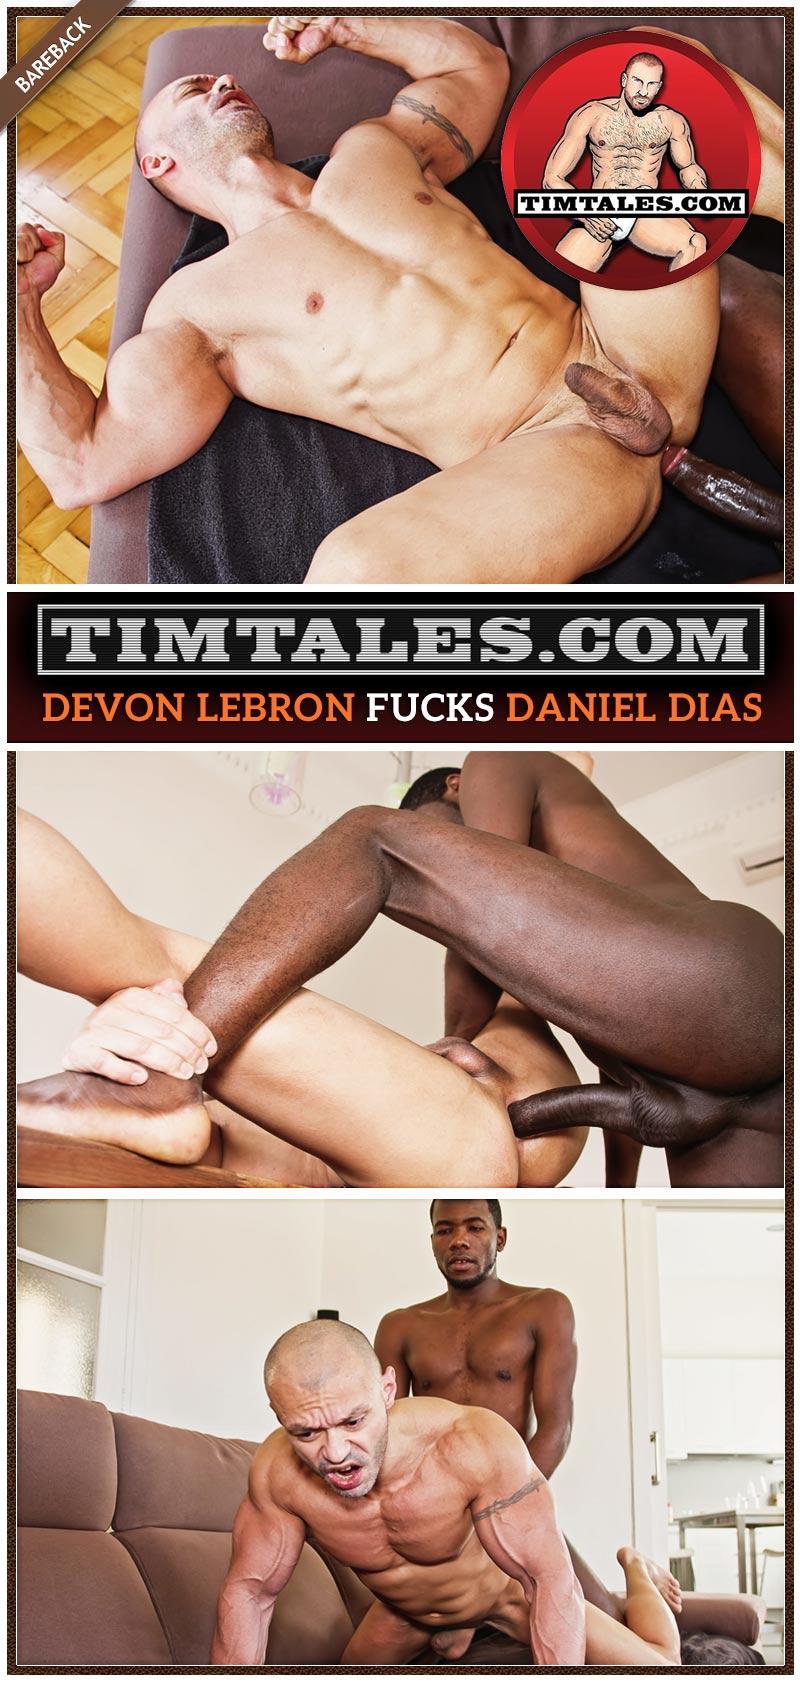 Devon Lebron Fucks Daniel Dias at TimTales